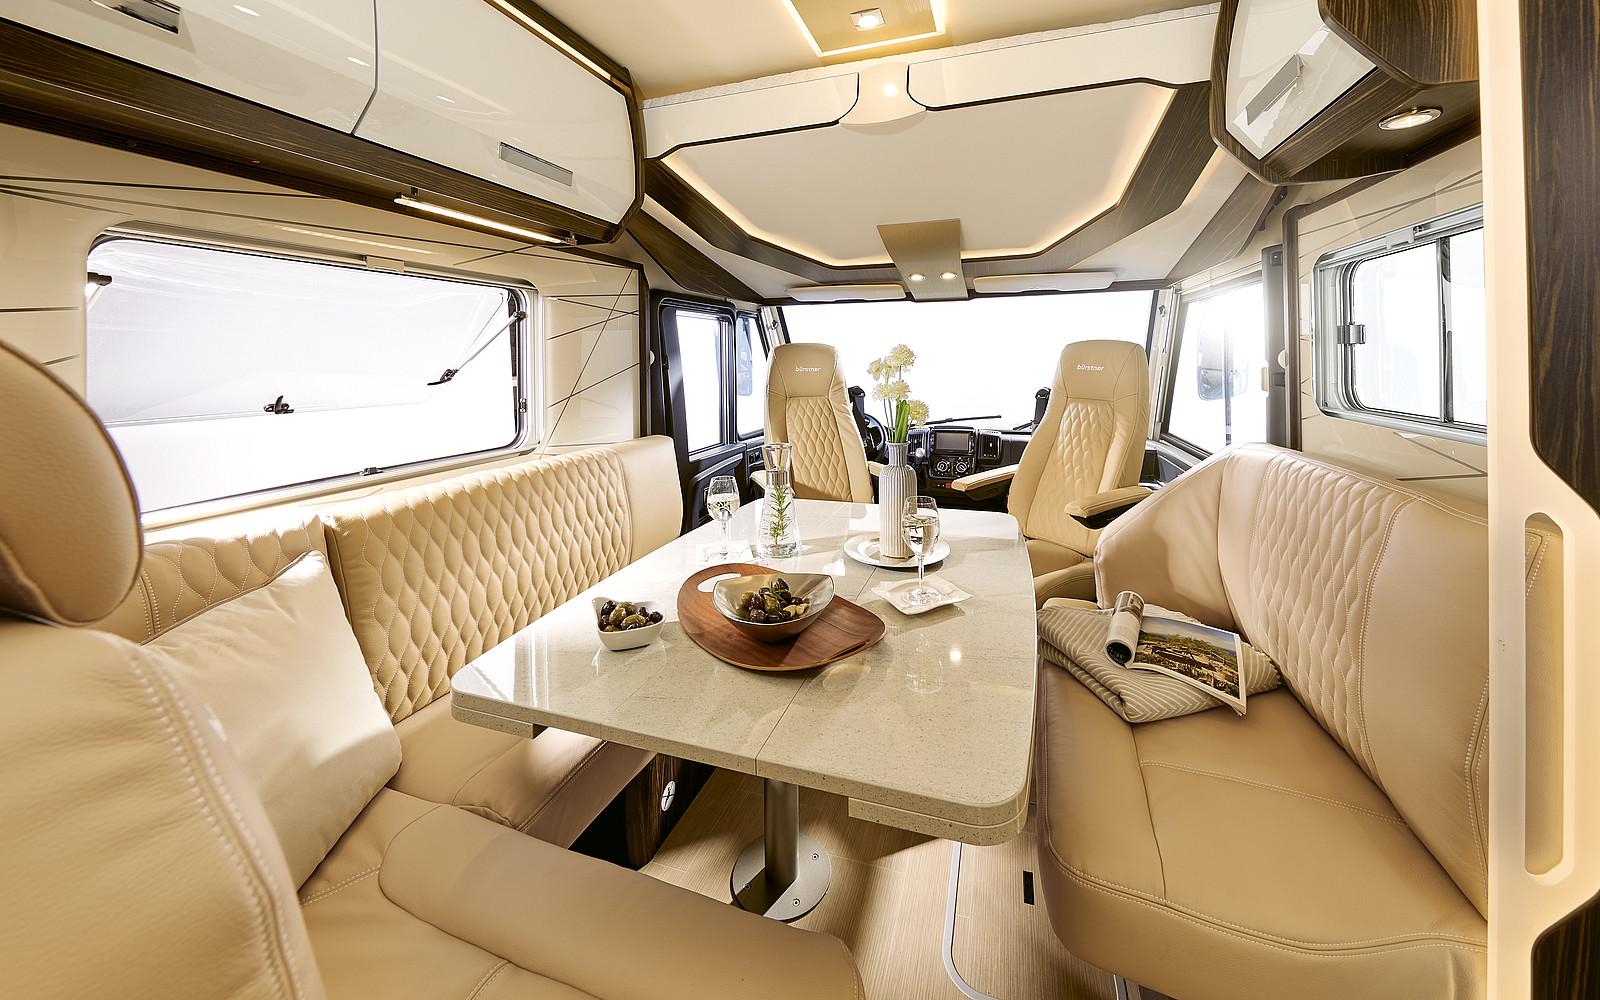 2020 Burstner Elegance Motorhome - Interior Photo - Front Lounge